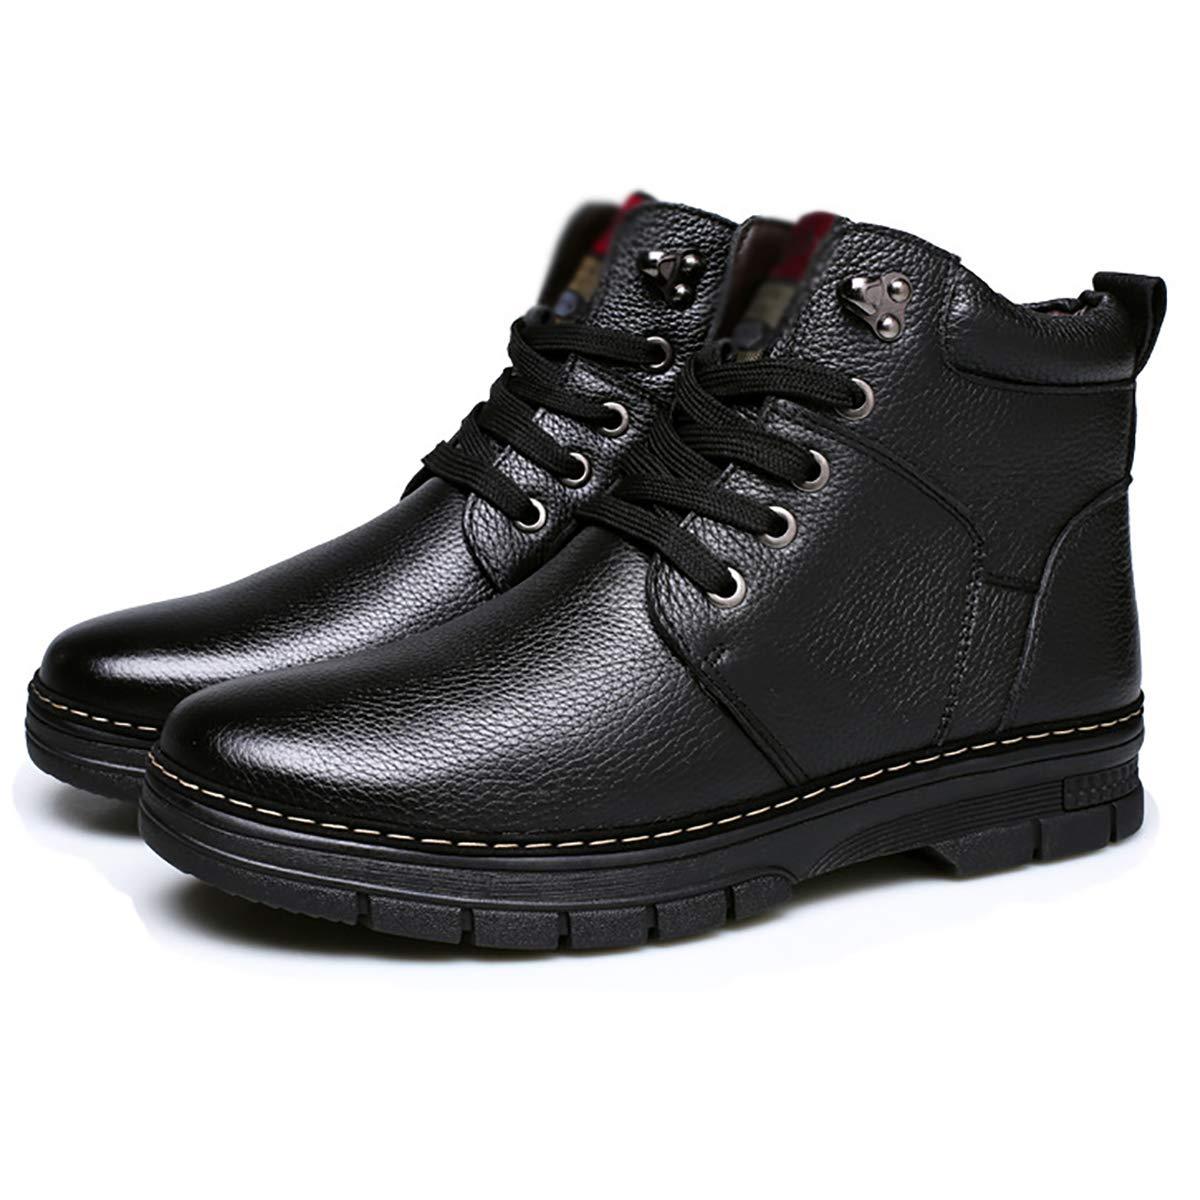 Fad-J Winter Herren Leder Schneeschuhe, warme Baumwollschuhe Stiefel mittleren Alters Vater Schuhe,schwarz,43